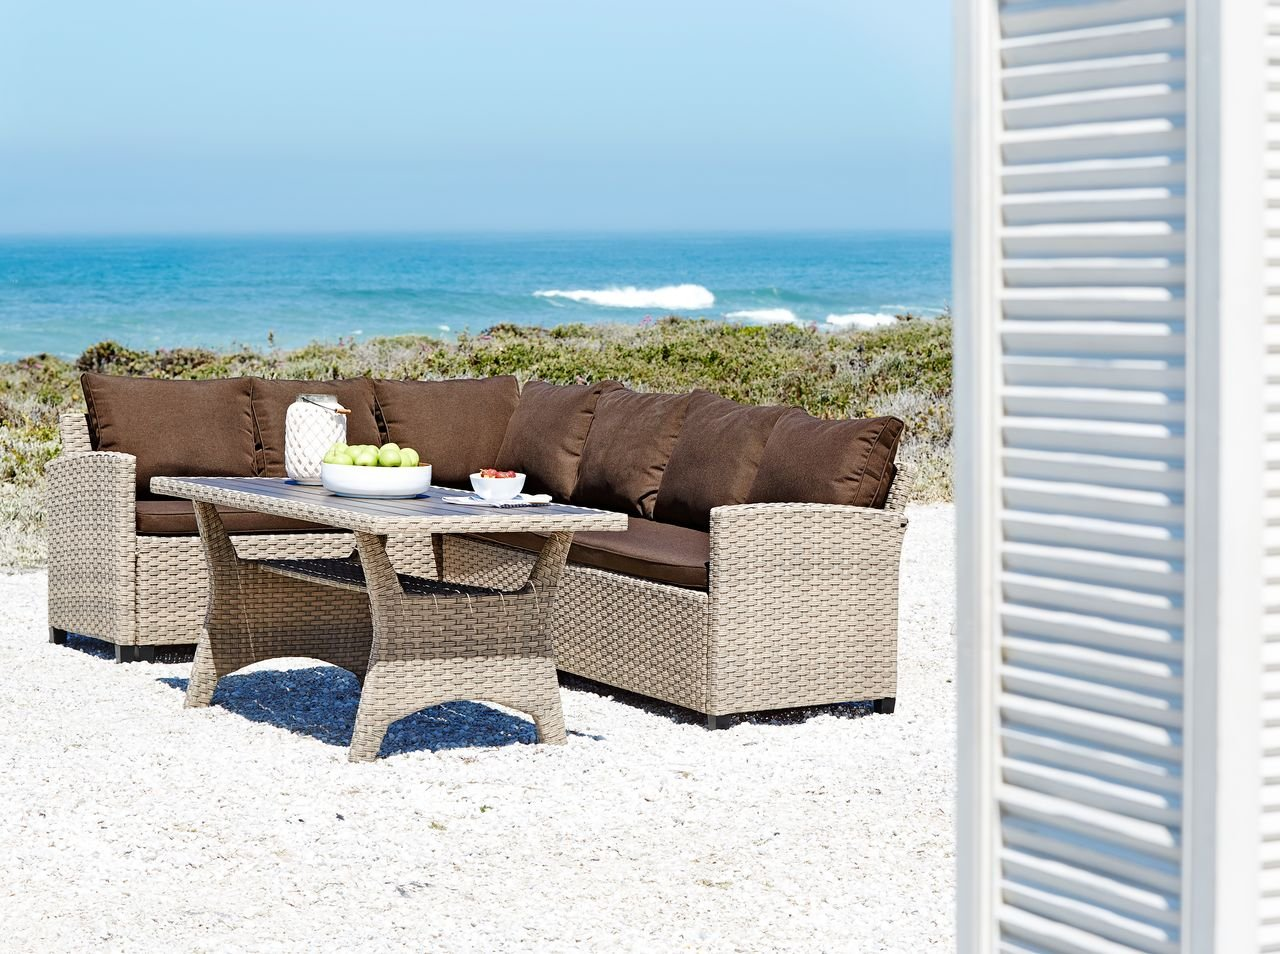 Jysk garden lounge set juelsminde 6 pers brown amazon co uk kitchen home